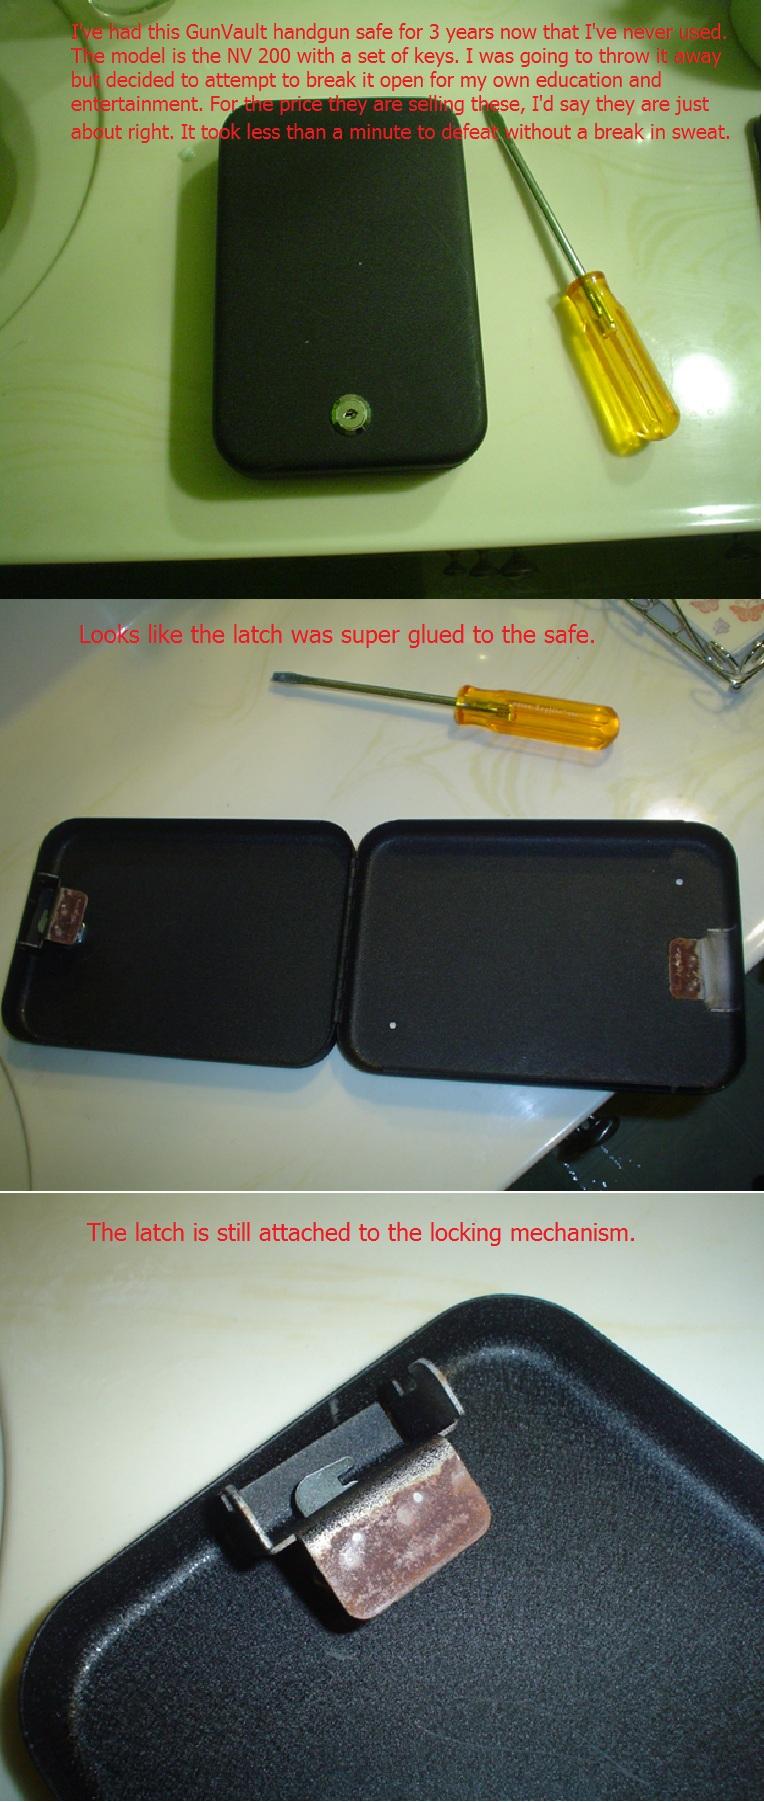 Electronic gun safe failure-gv200-failed-latch-screwdriver.jpg